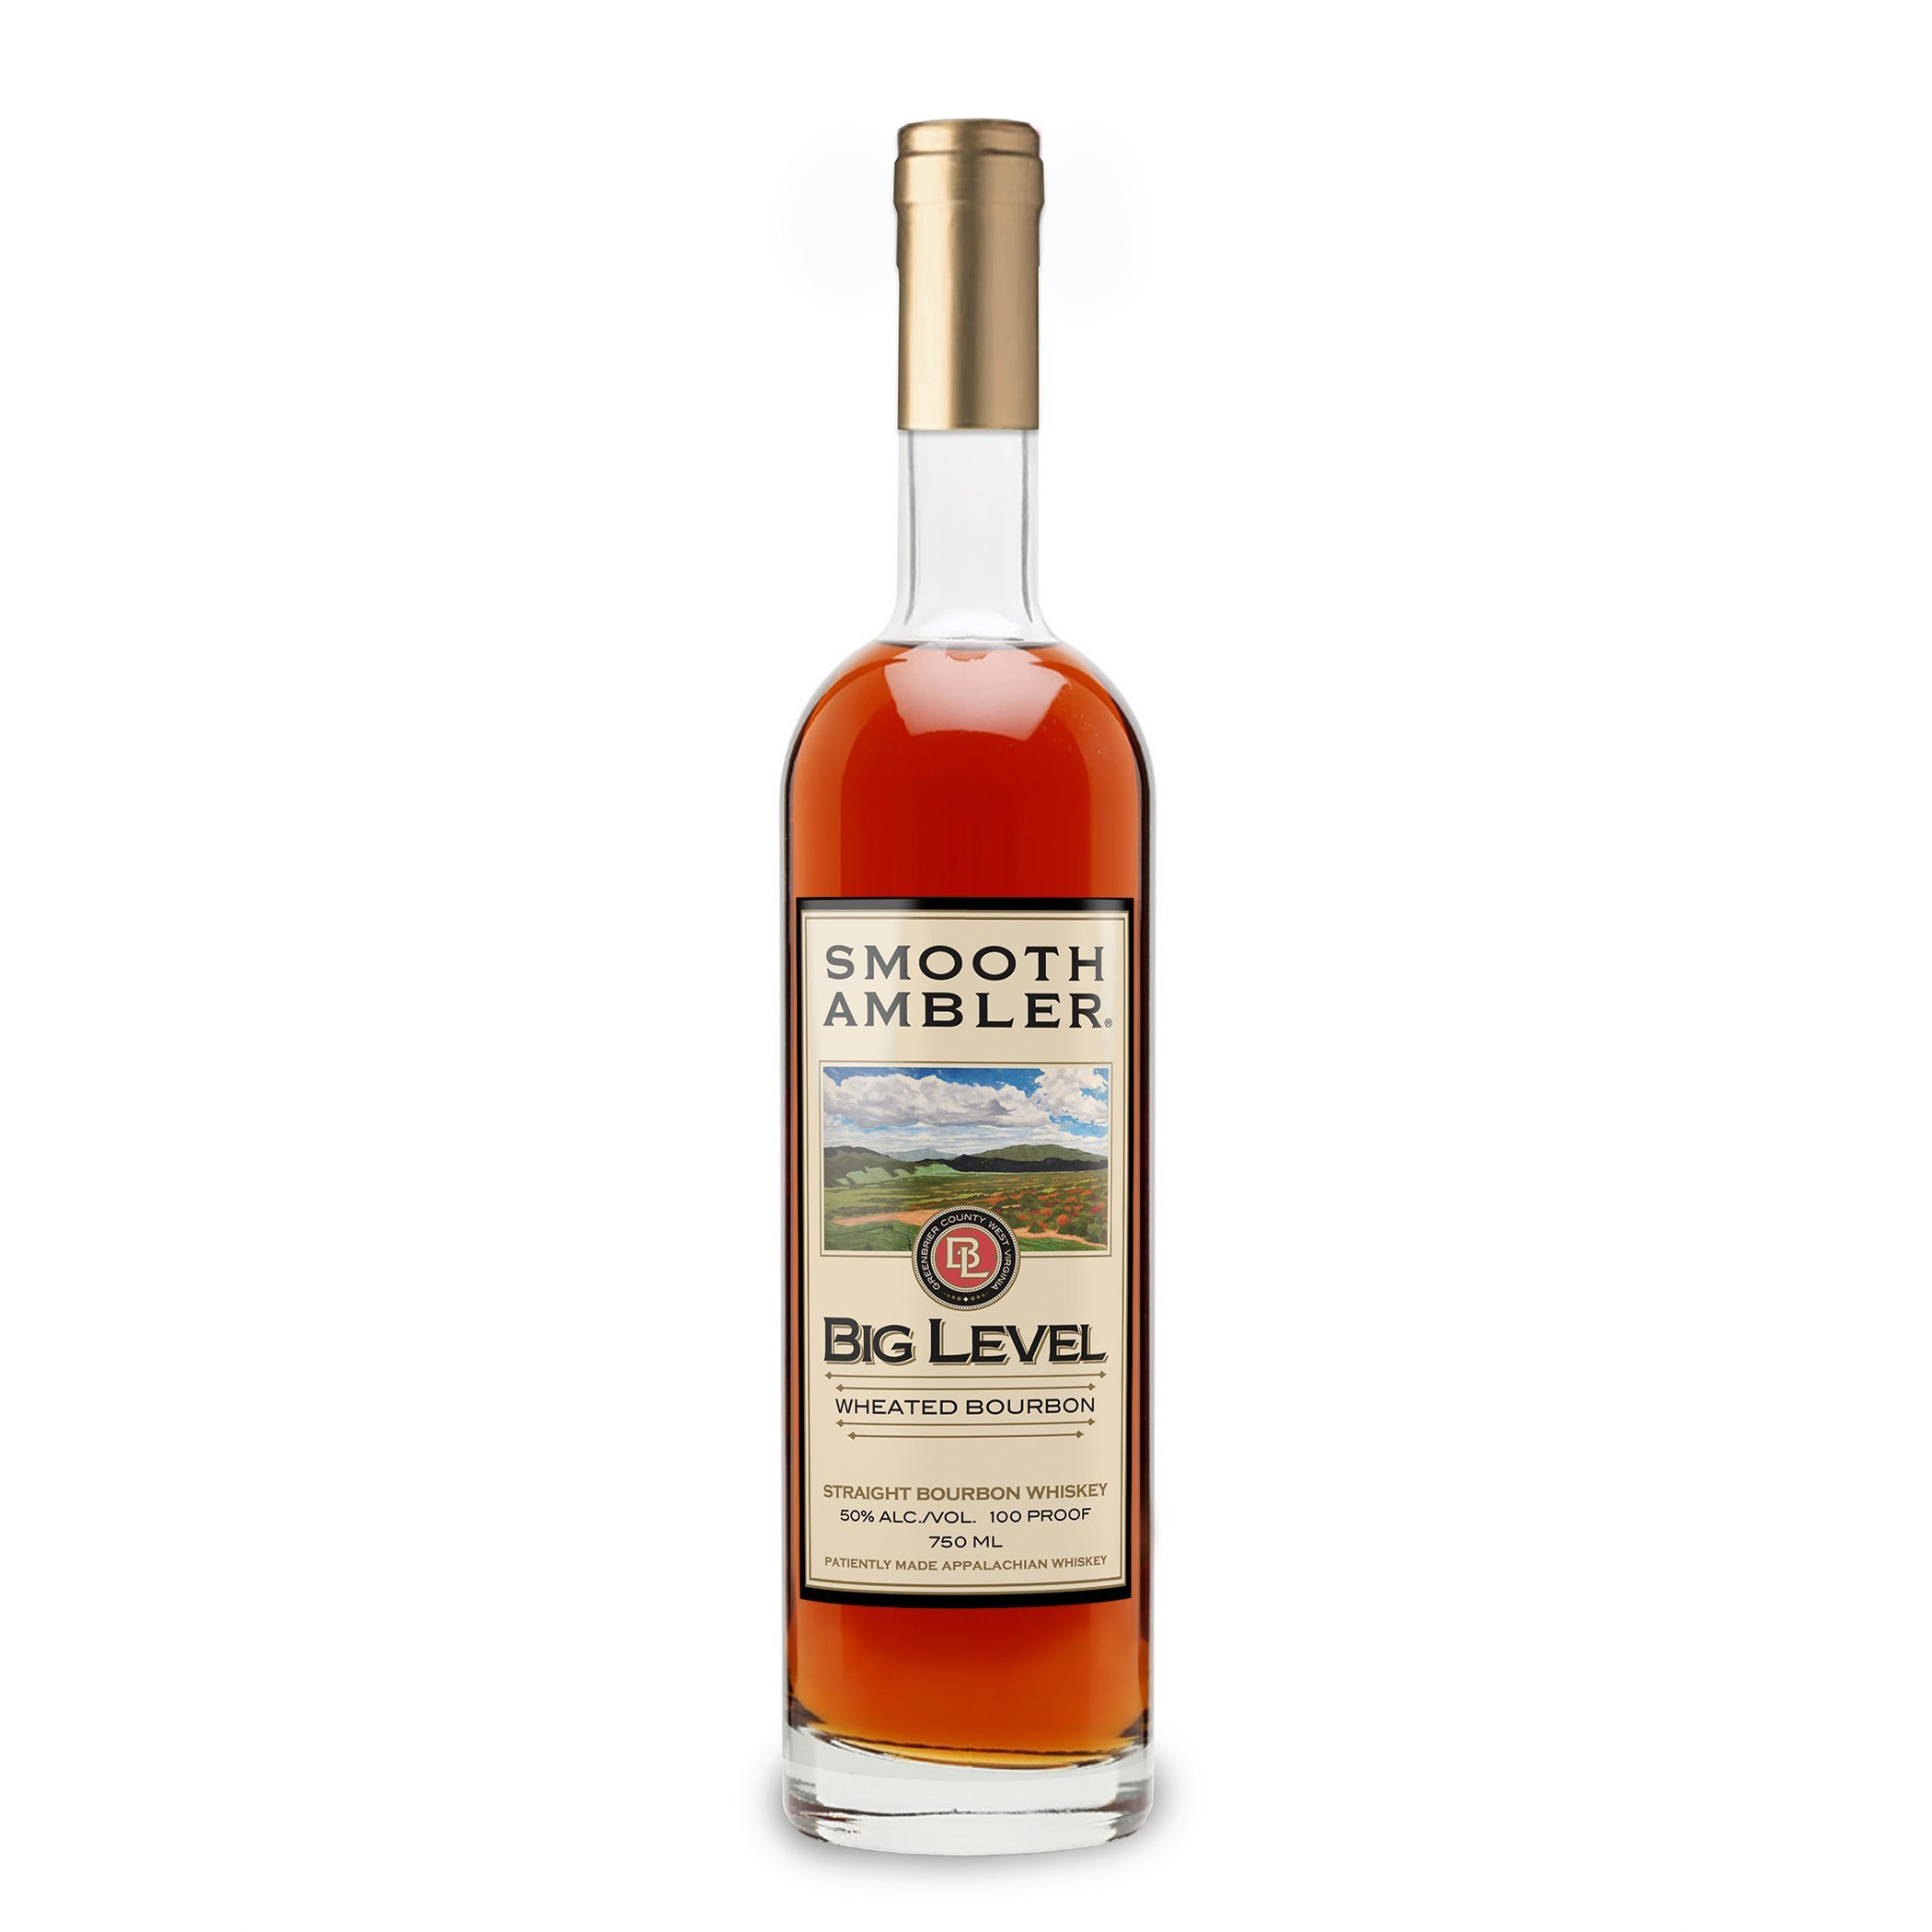 Smooth Ambler Big Level Wheated Bourbon 750ml